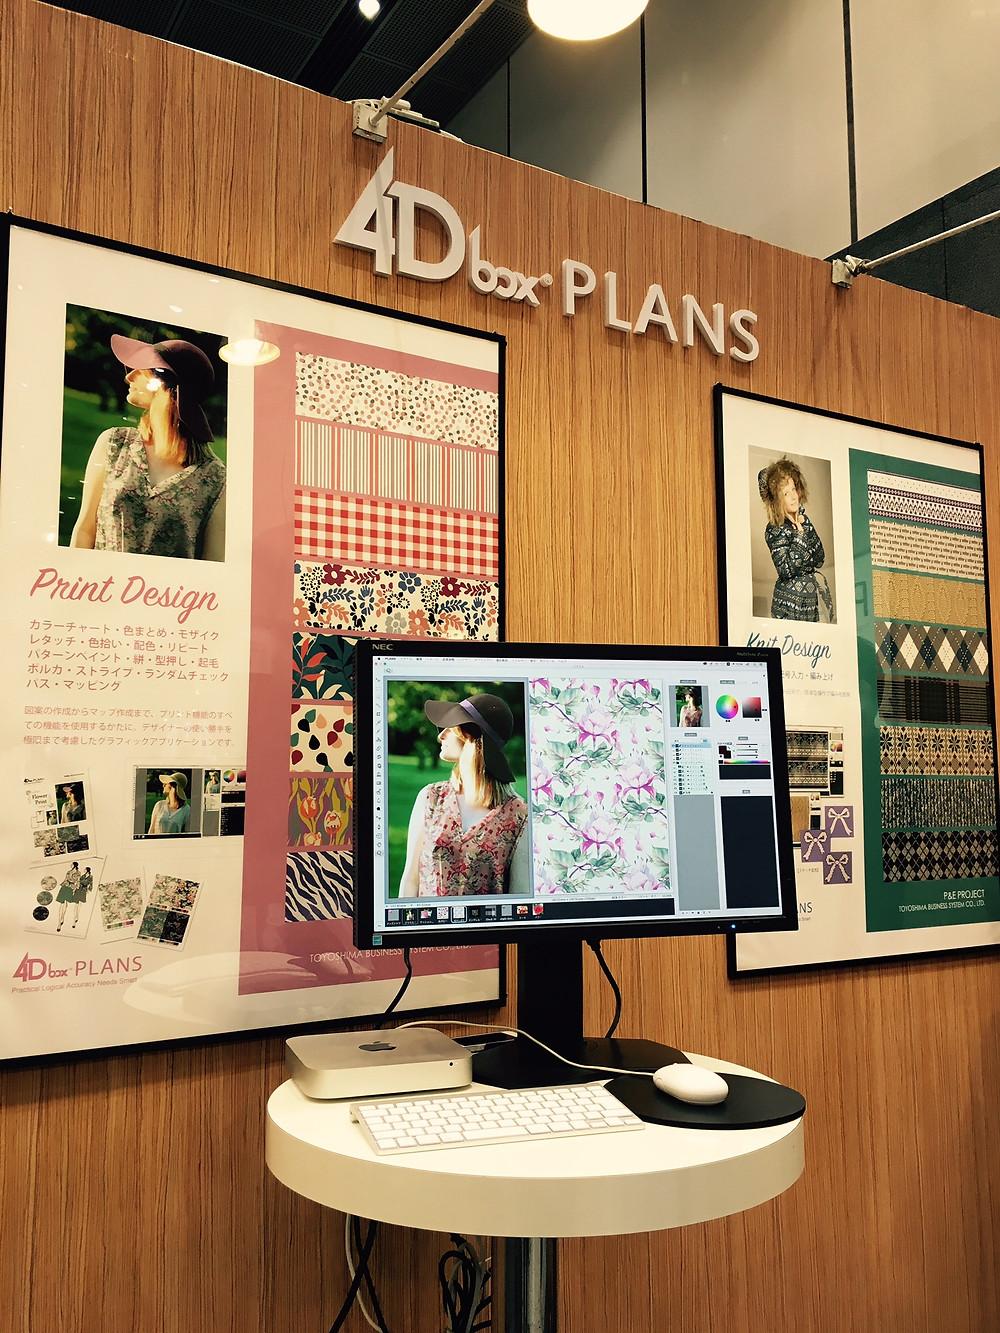 JAPAN CREATION テキスタイルシミュレーション 4Dbox PLANS